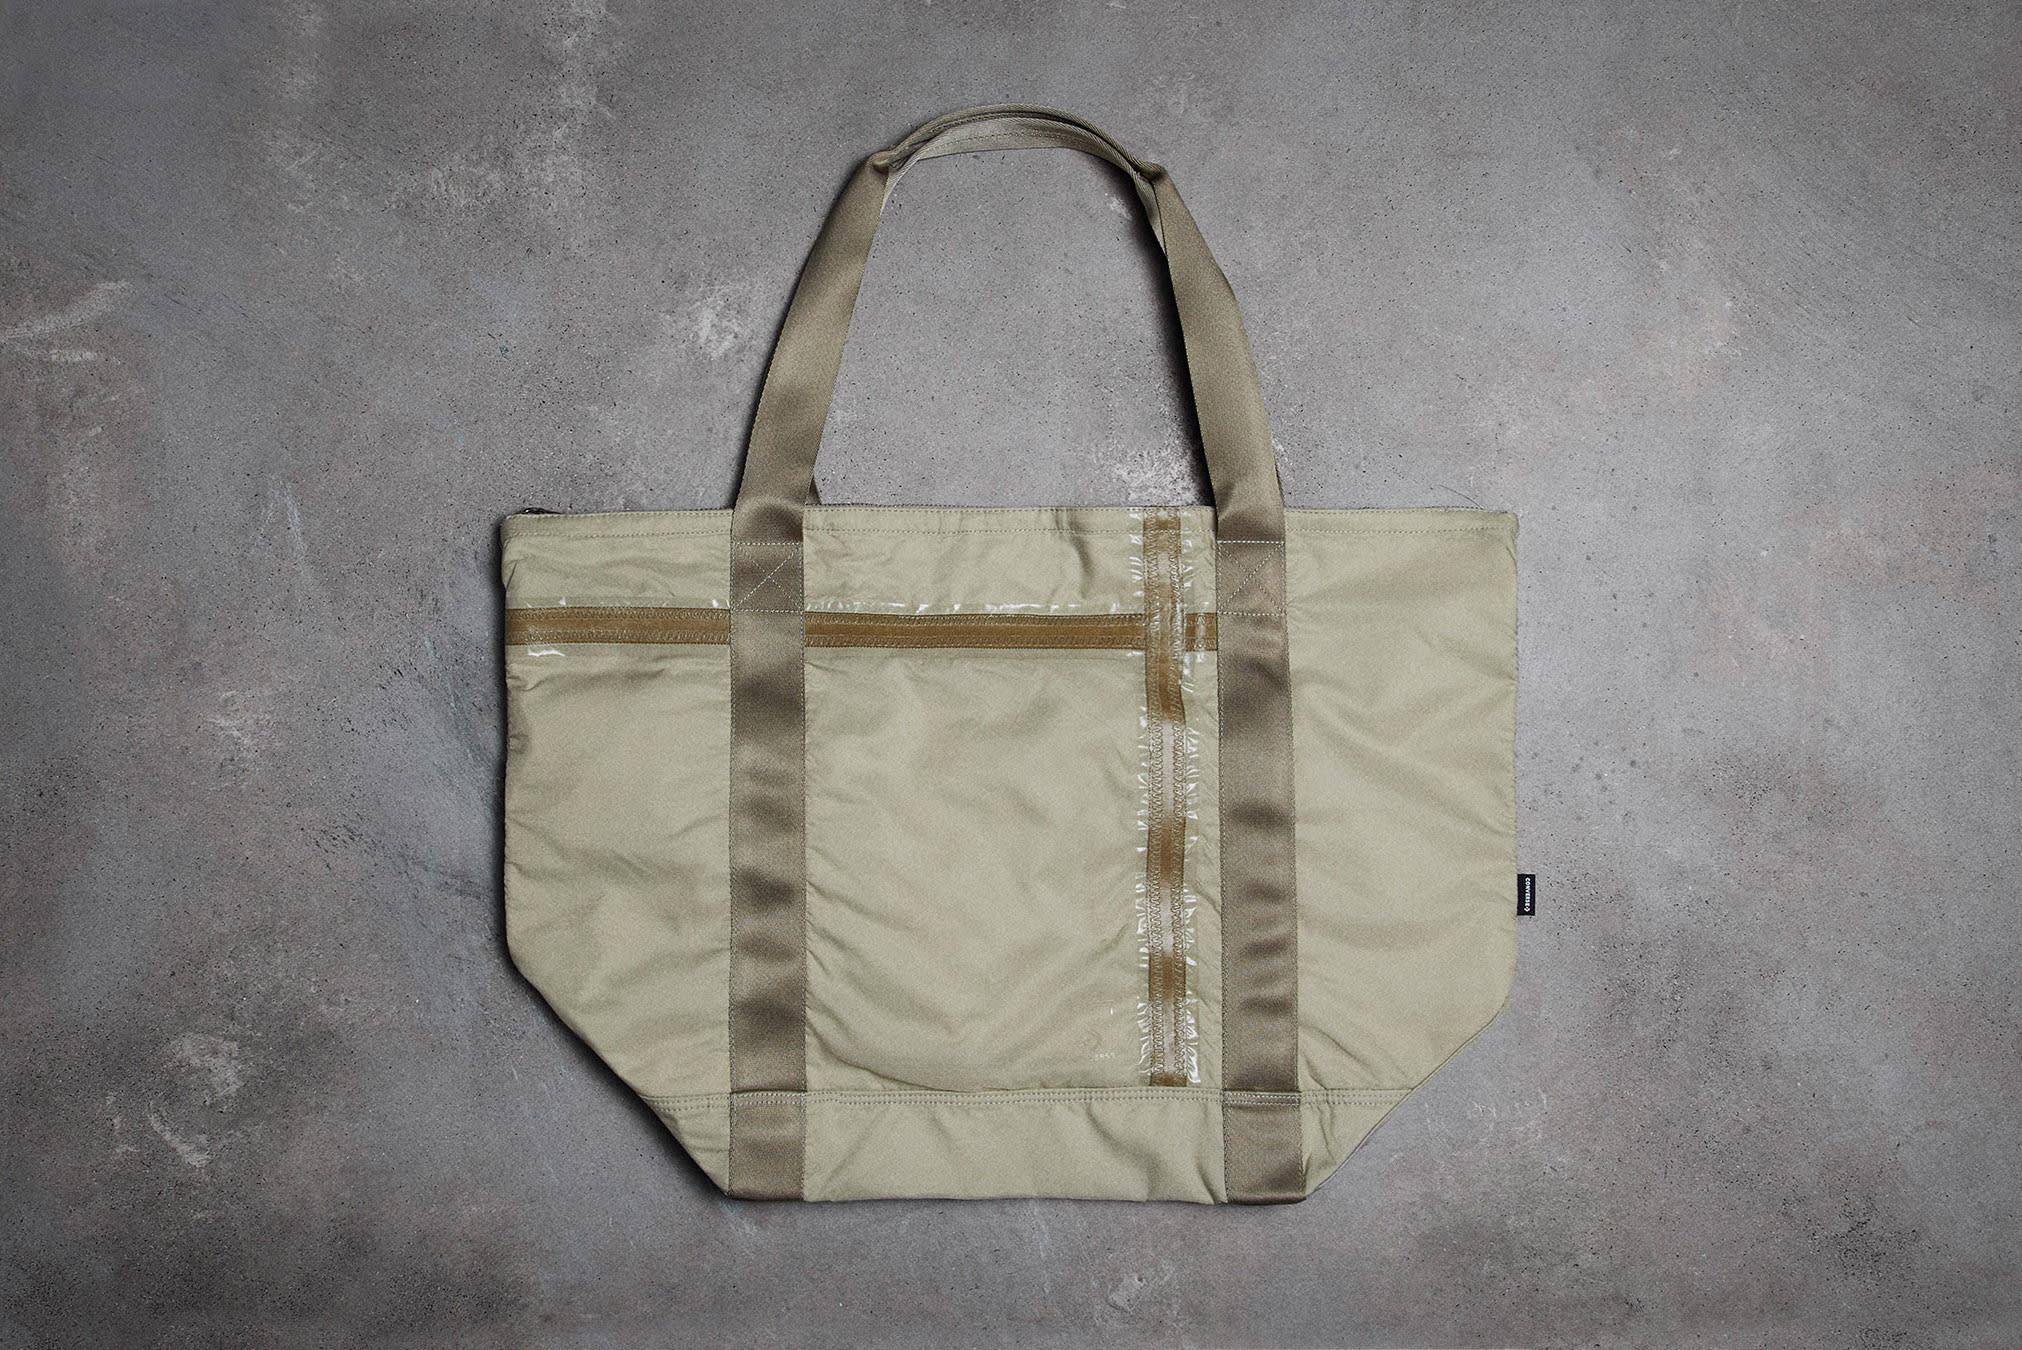 Converse x A-COLD-WALL* Tote Bag - 10019367-A01